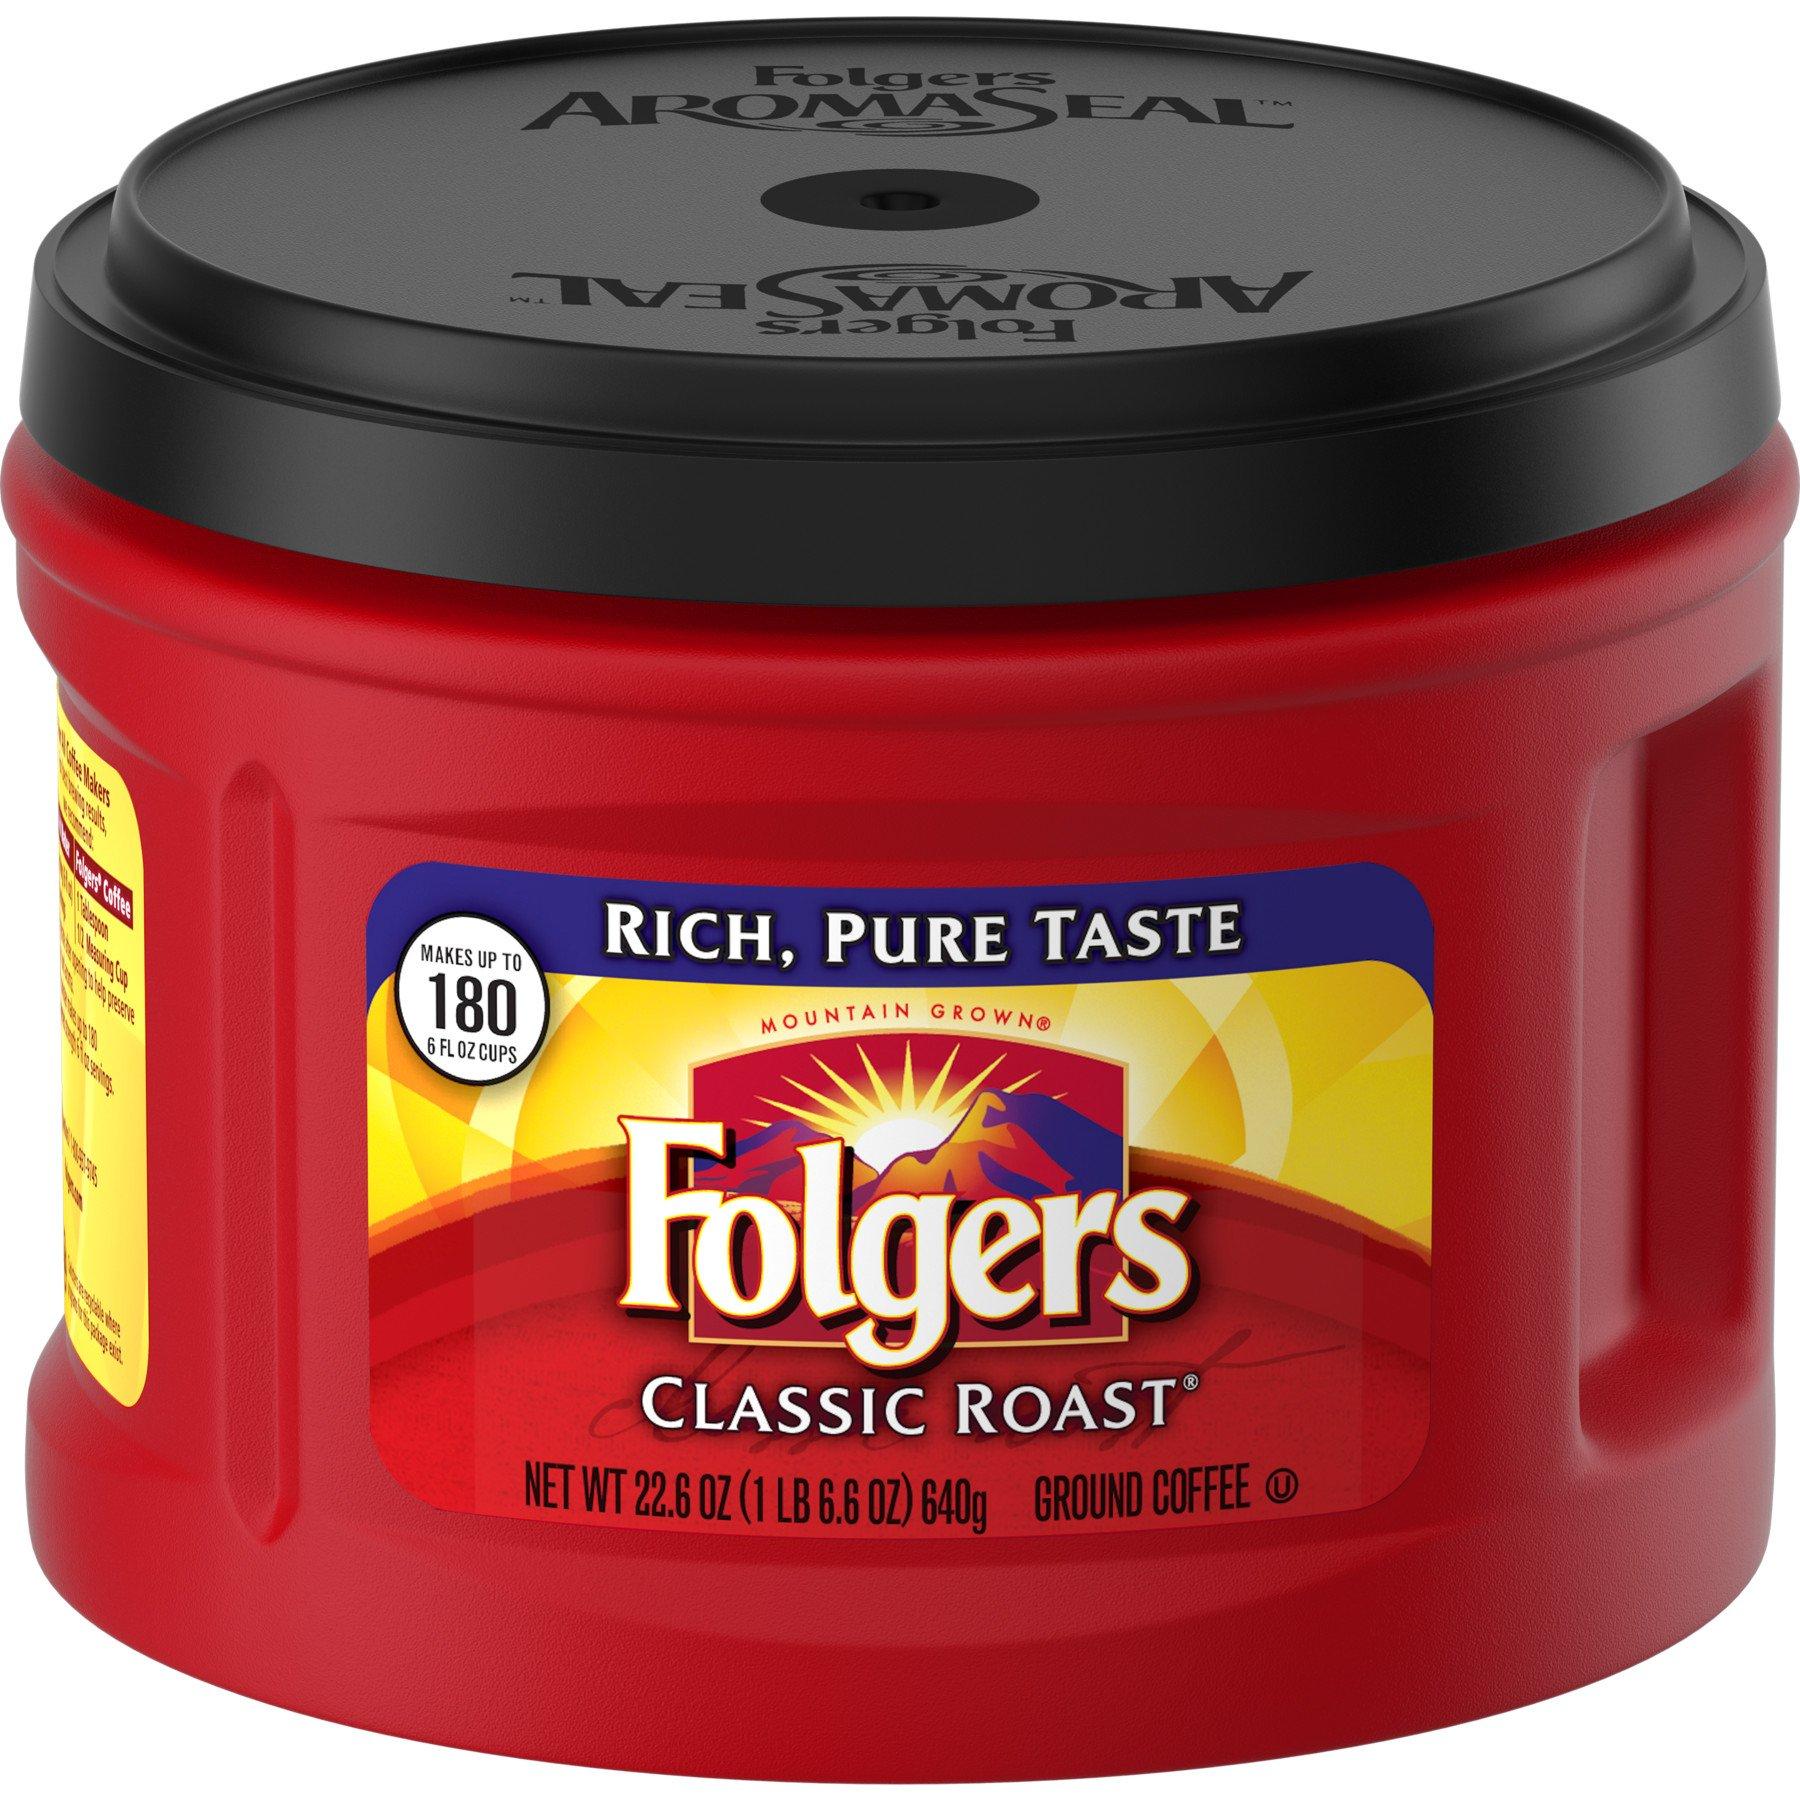 Folgers Classic Roast, Ground Coffee, Medium Roast, 22.6 Ounce, 3 Count